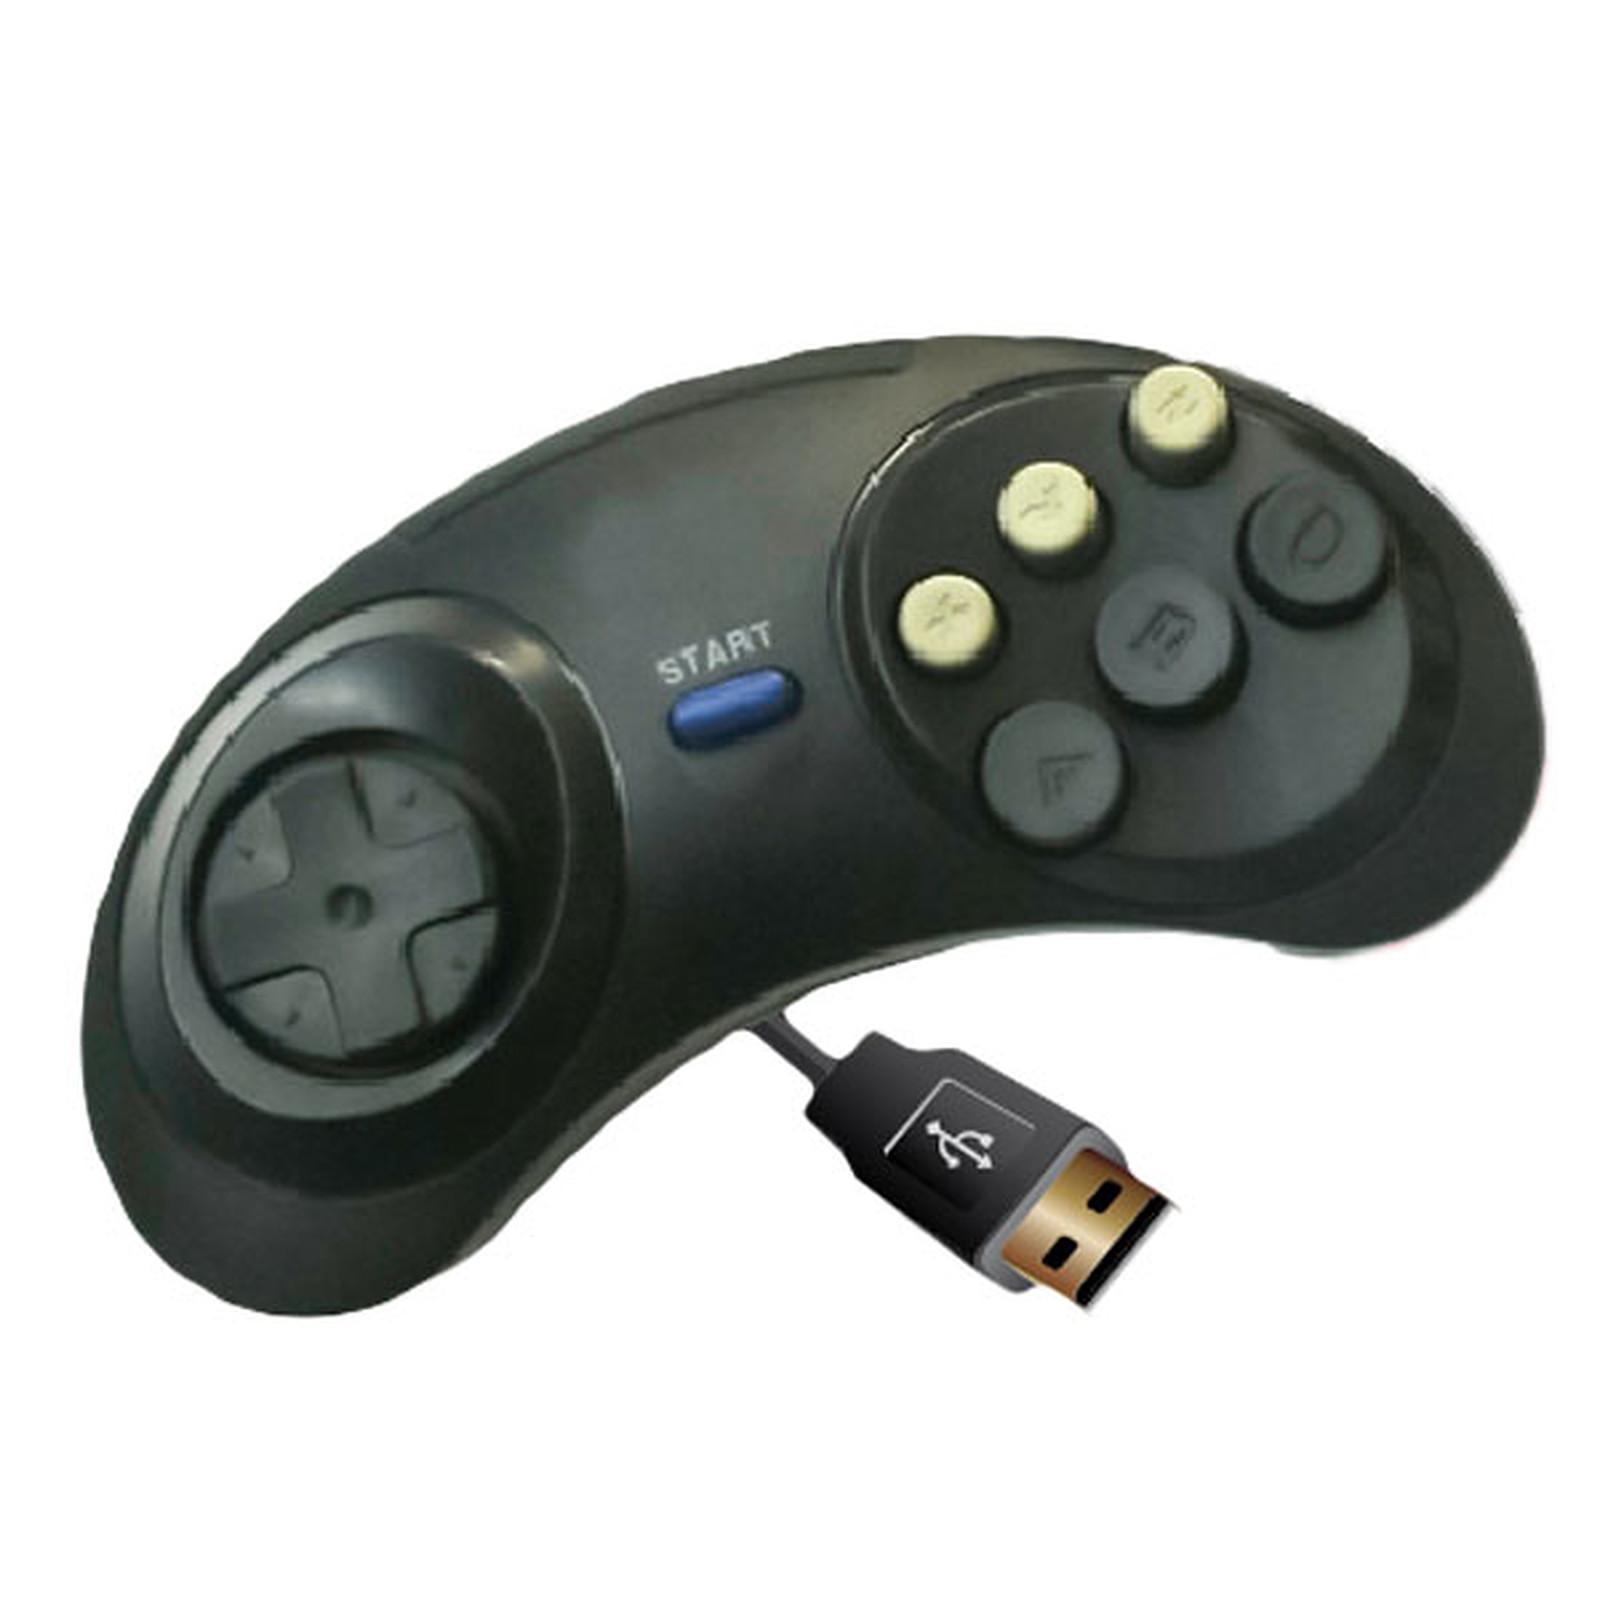 Manette USB pour rétrogaming (Sega Megadrive)